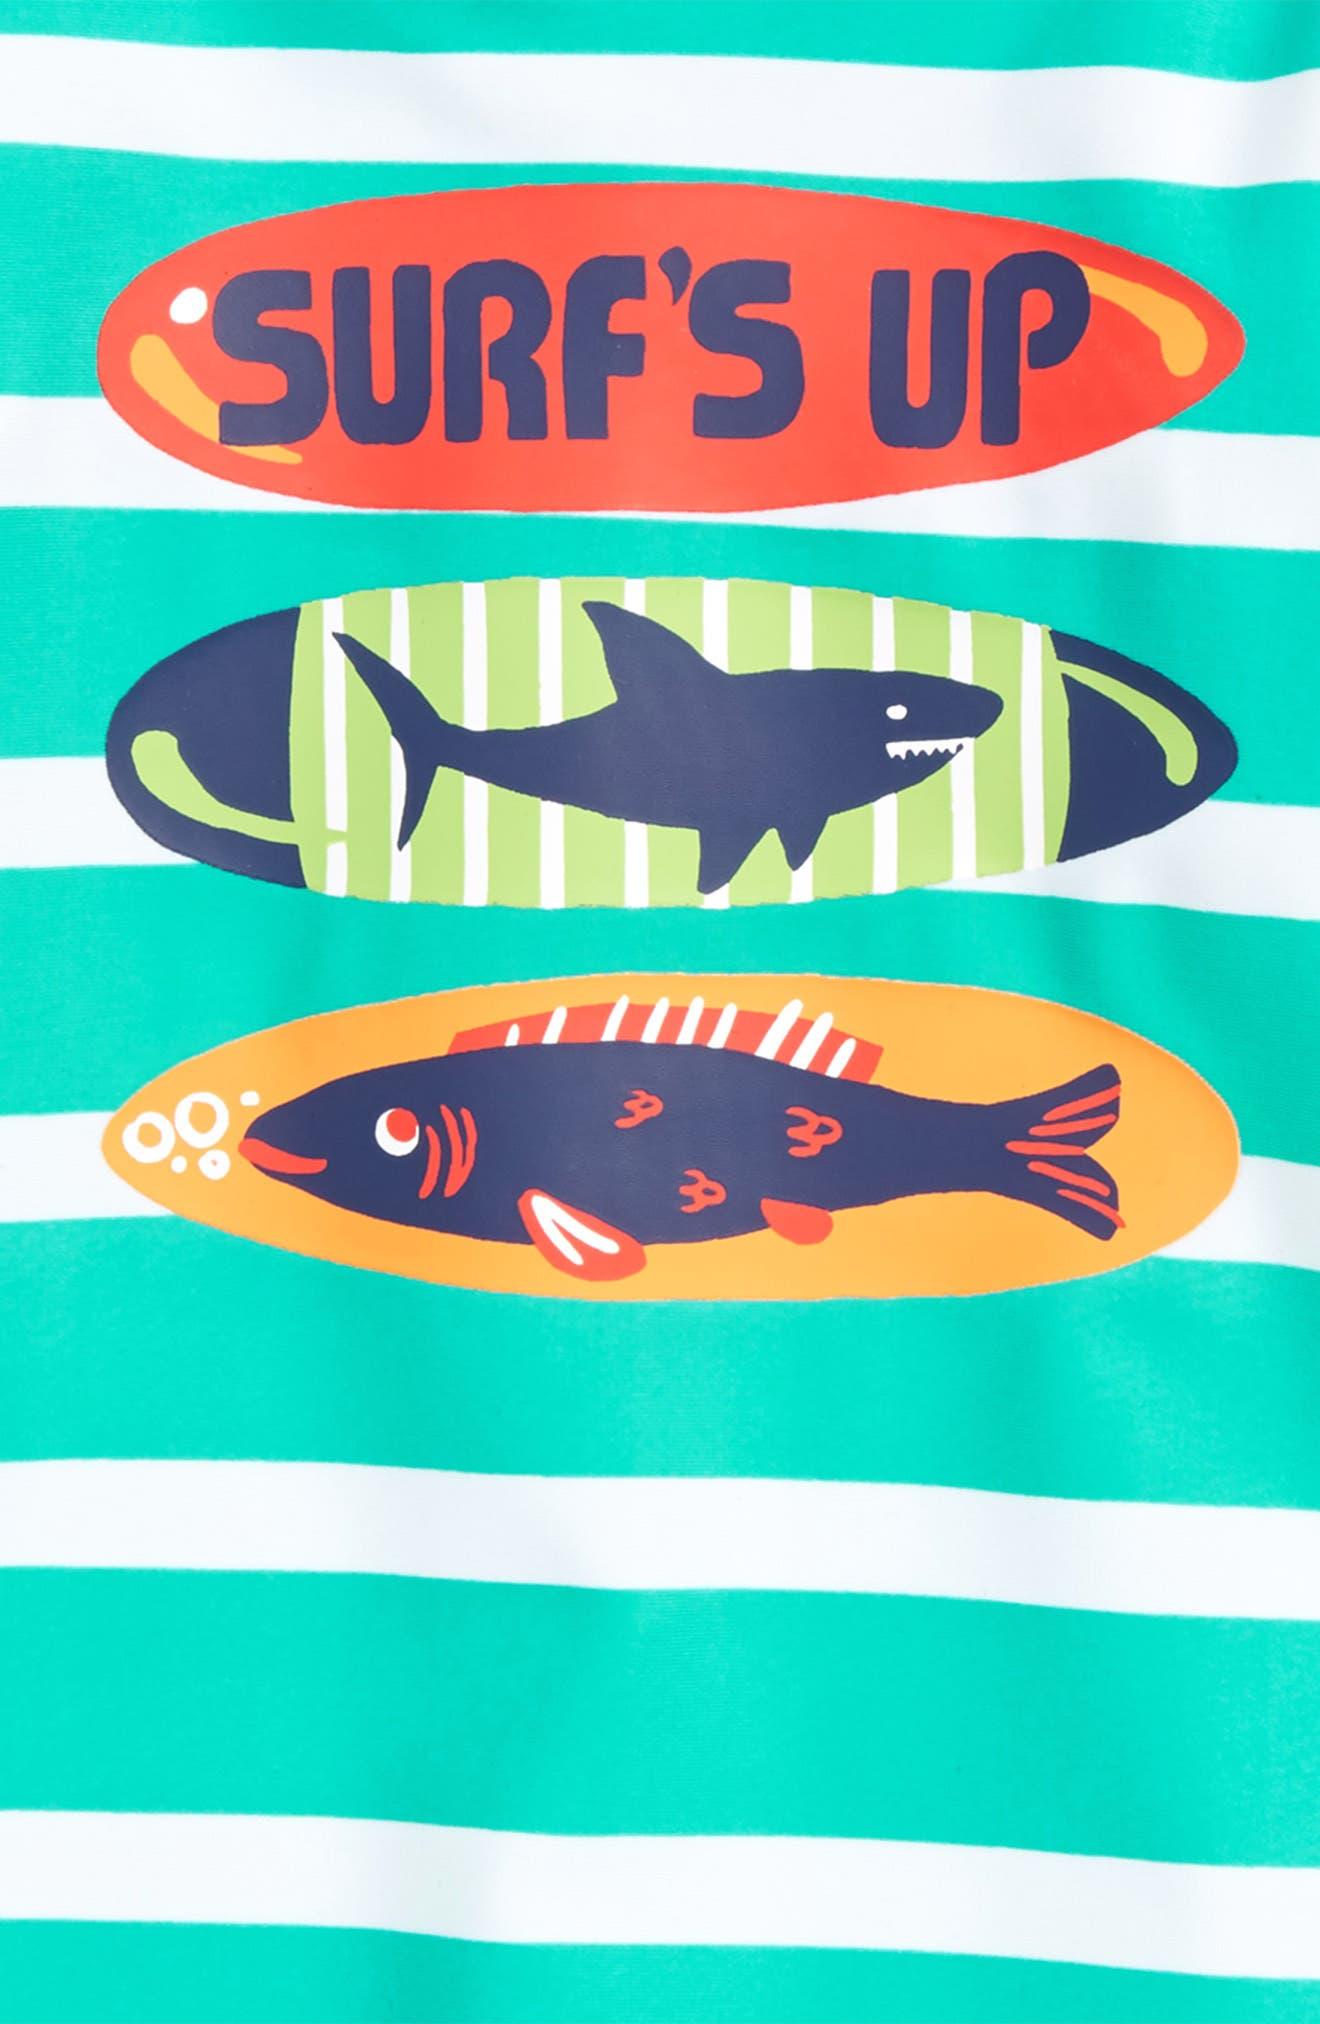 Surfboards One-Piece Rashguard Swimsuit,                             Main thumbnail 1, color,